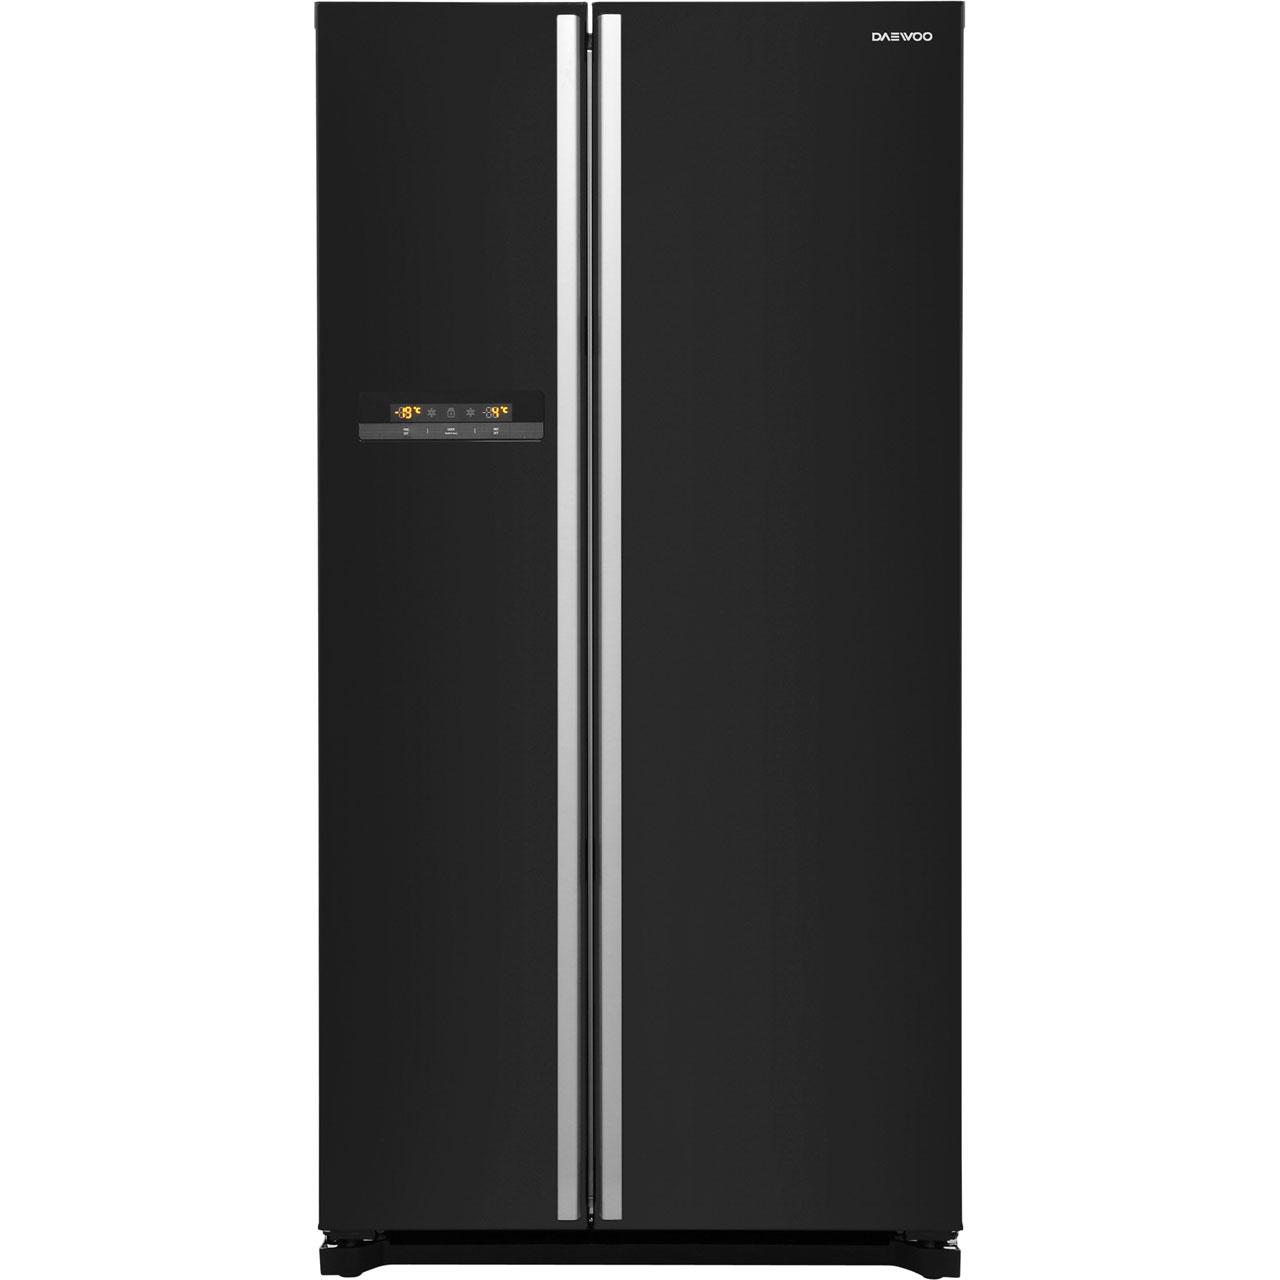 Daewoo FRAX22B3B Free Standing American Fridge Freezer in Black